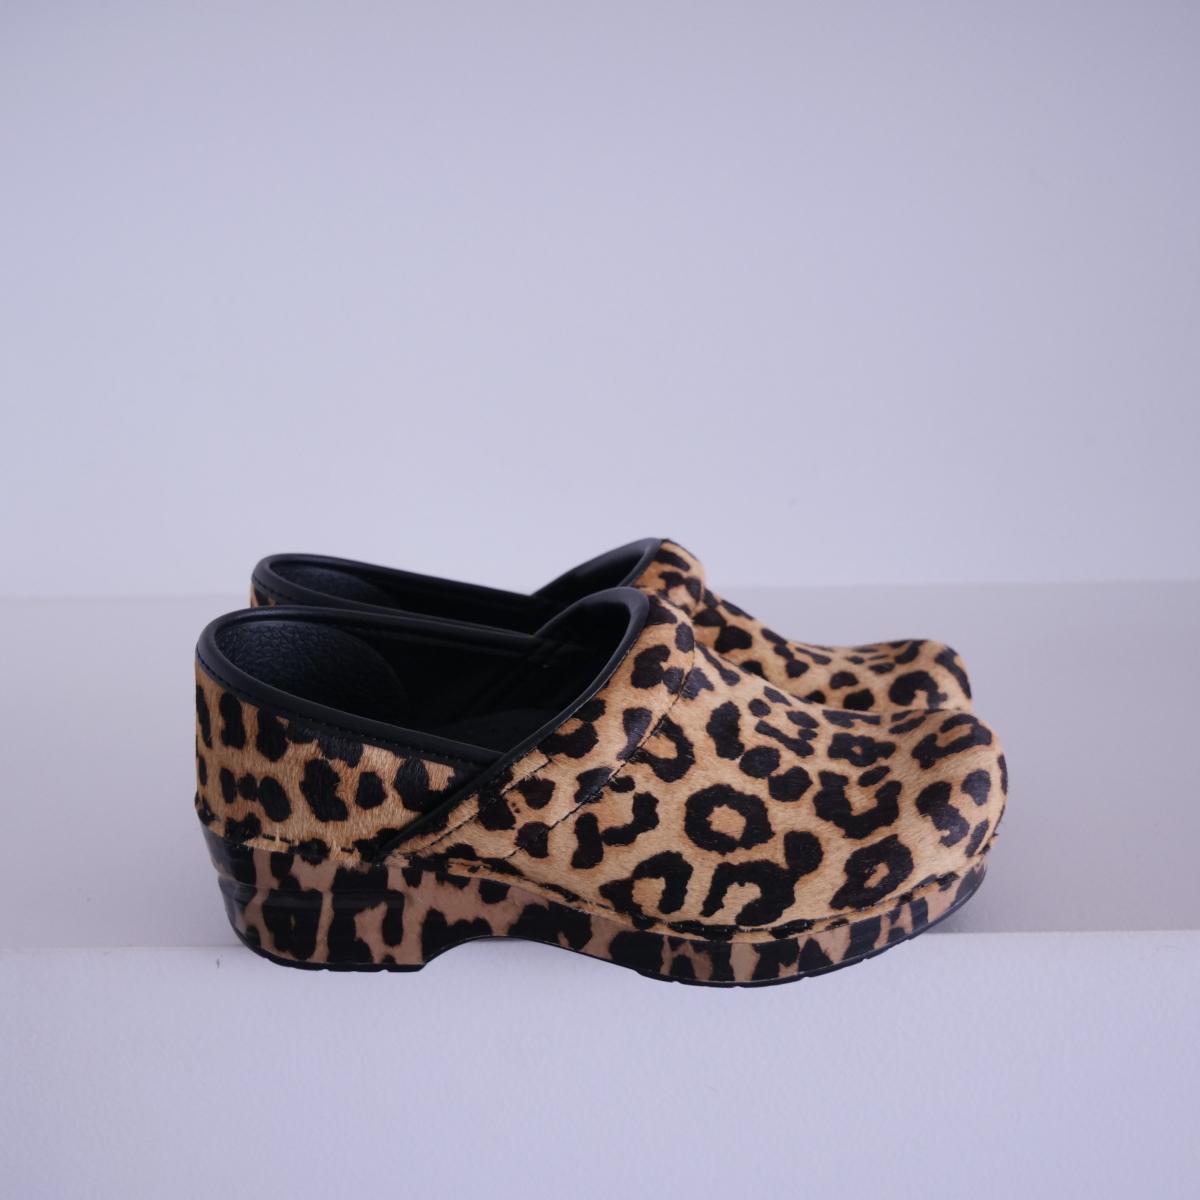 Professional Leopard Print Haircalf